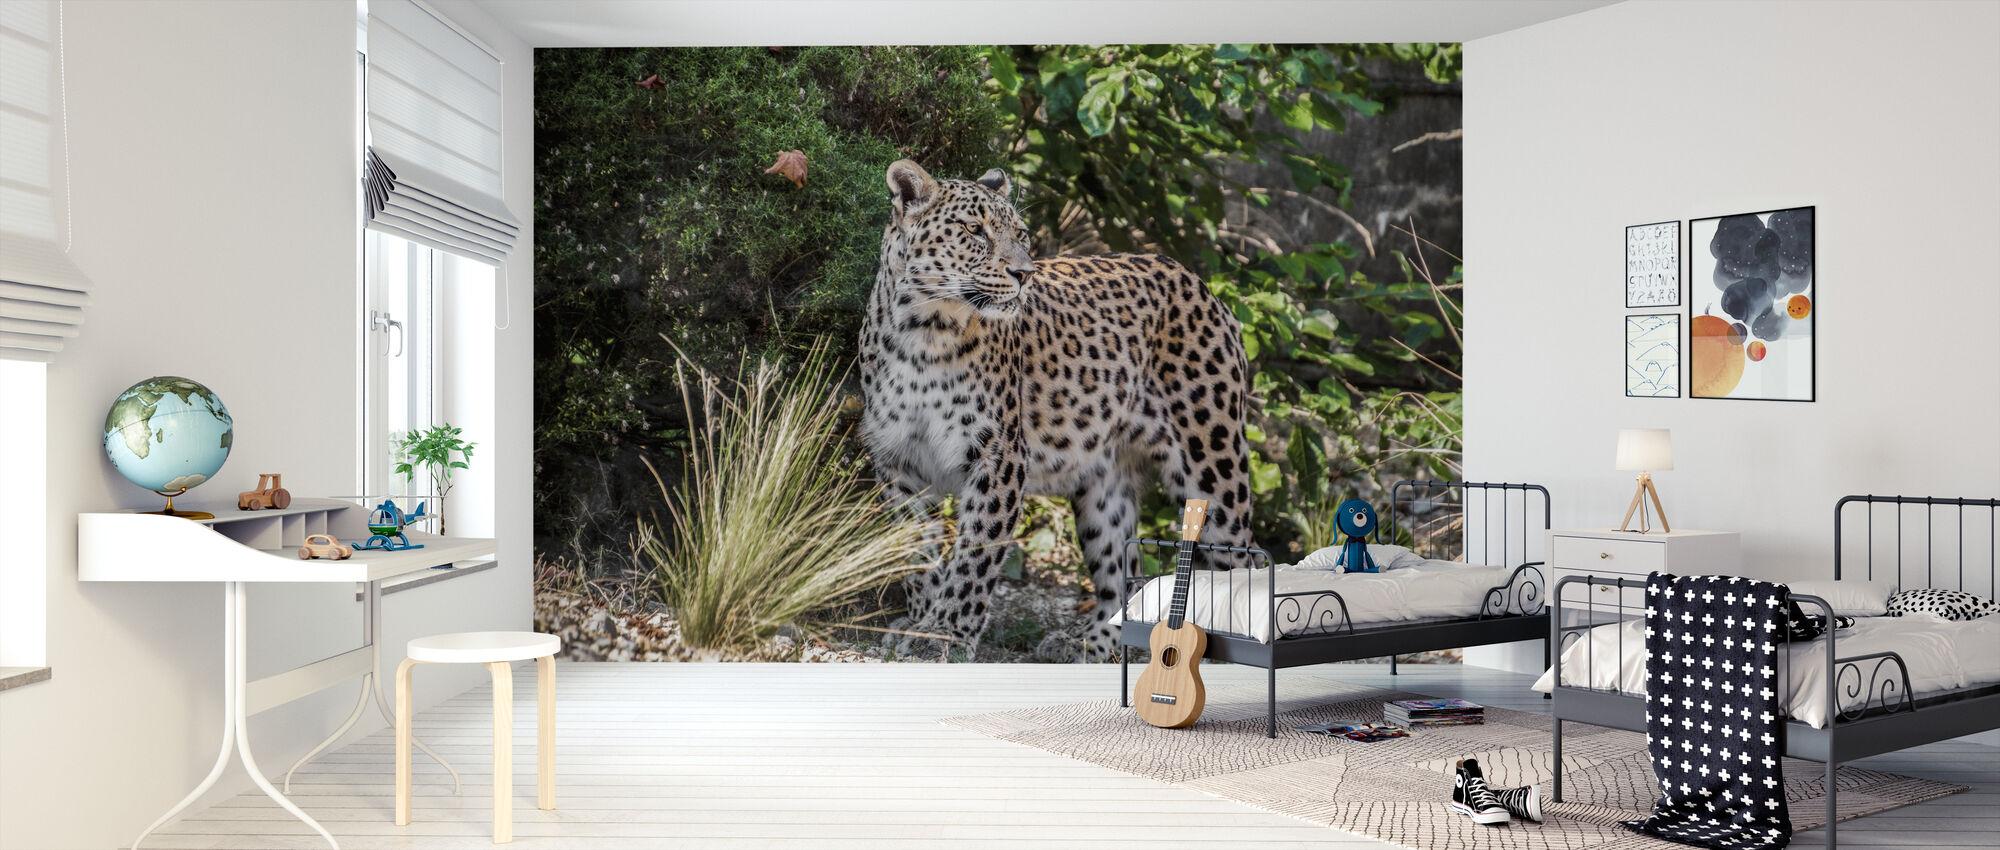 Leopard Stares - Wallpaper - Kids Room